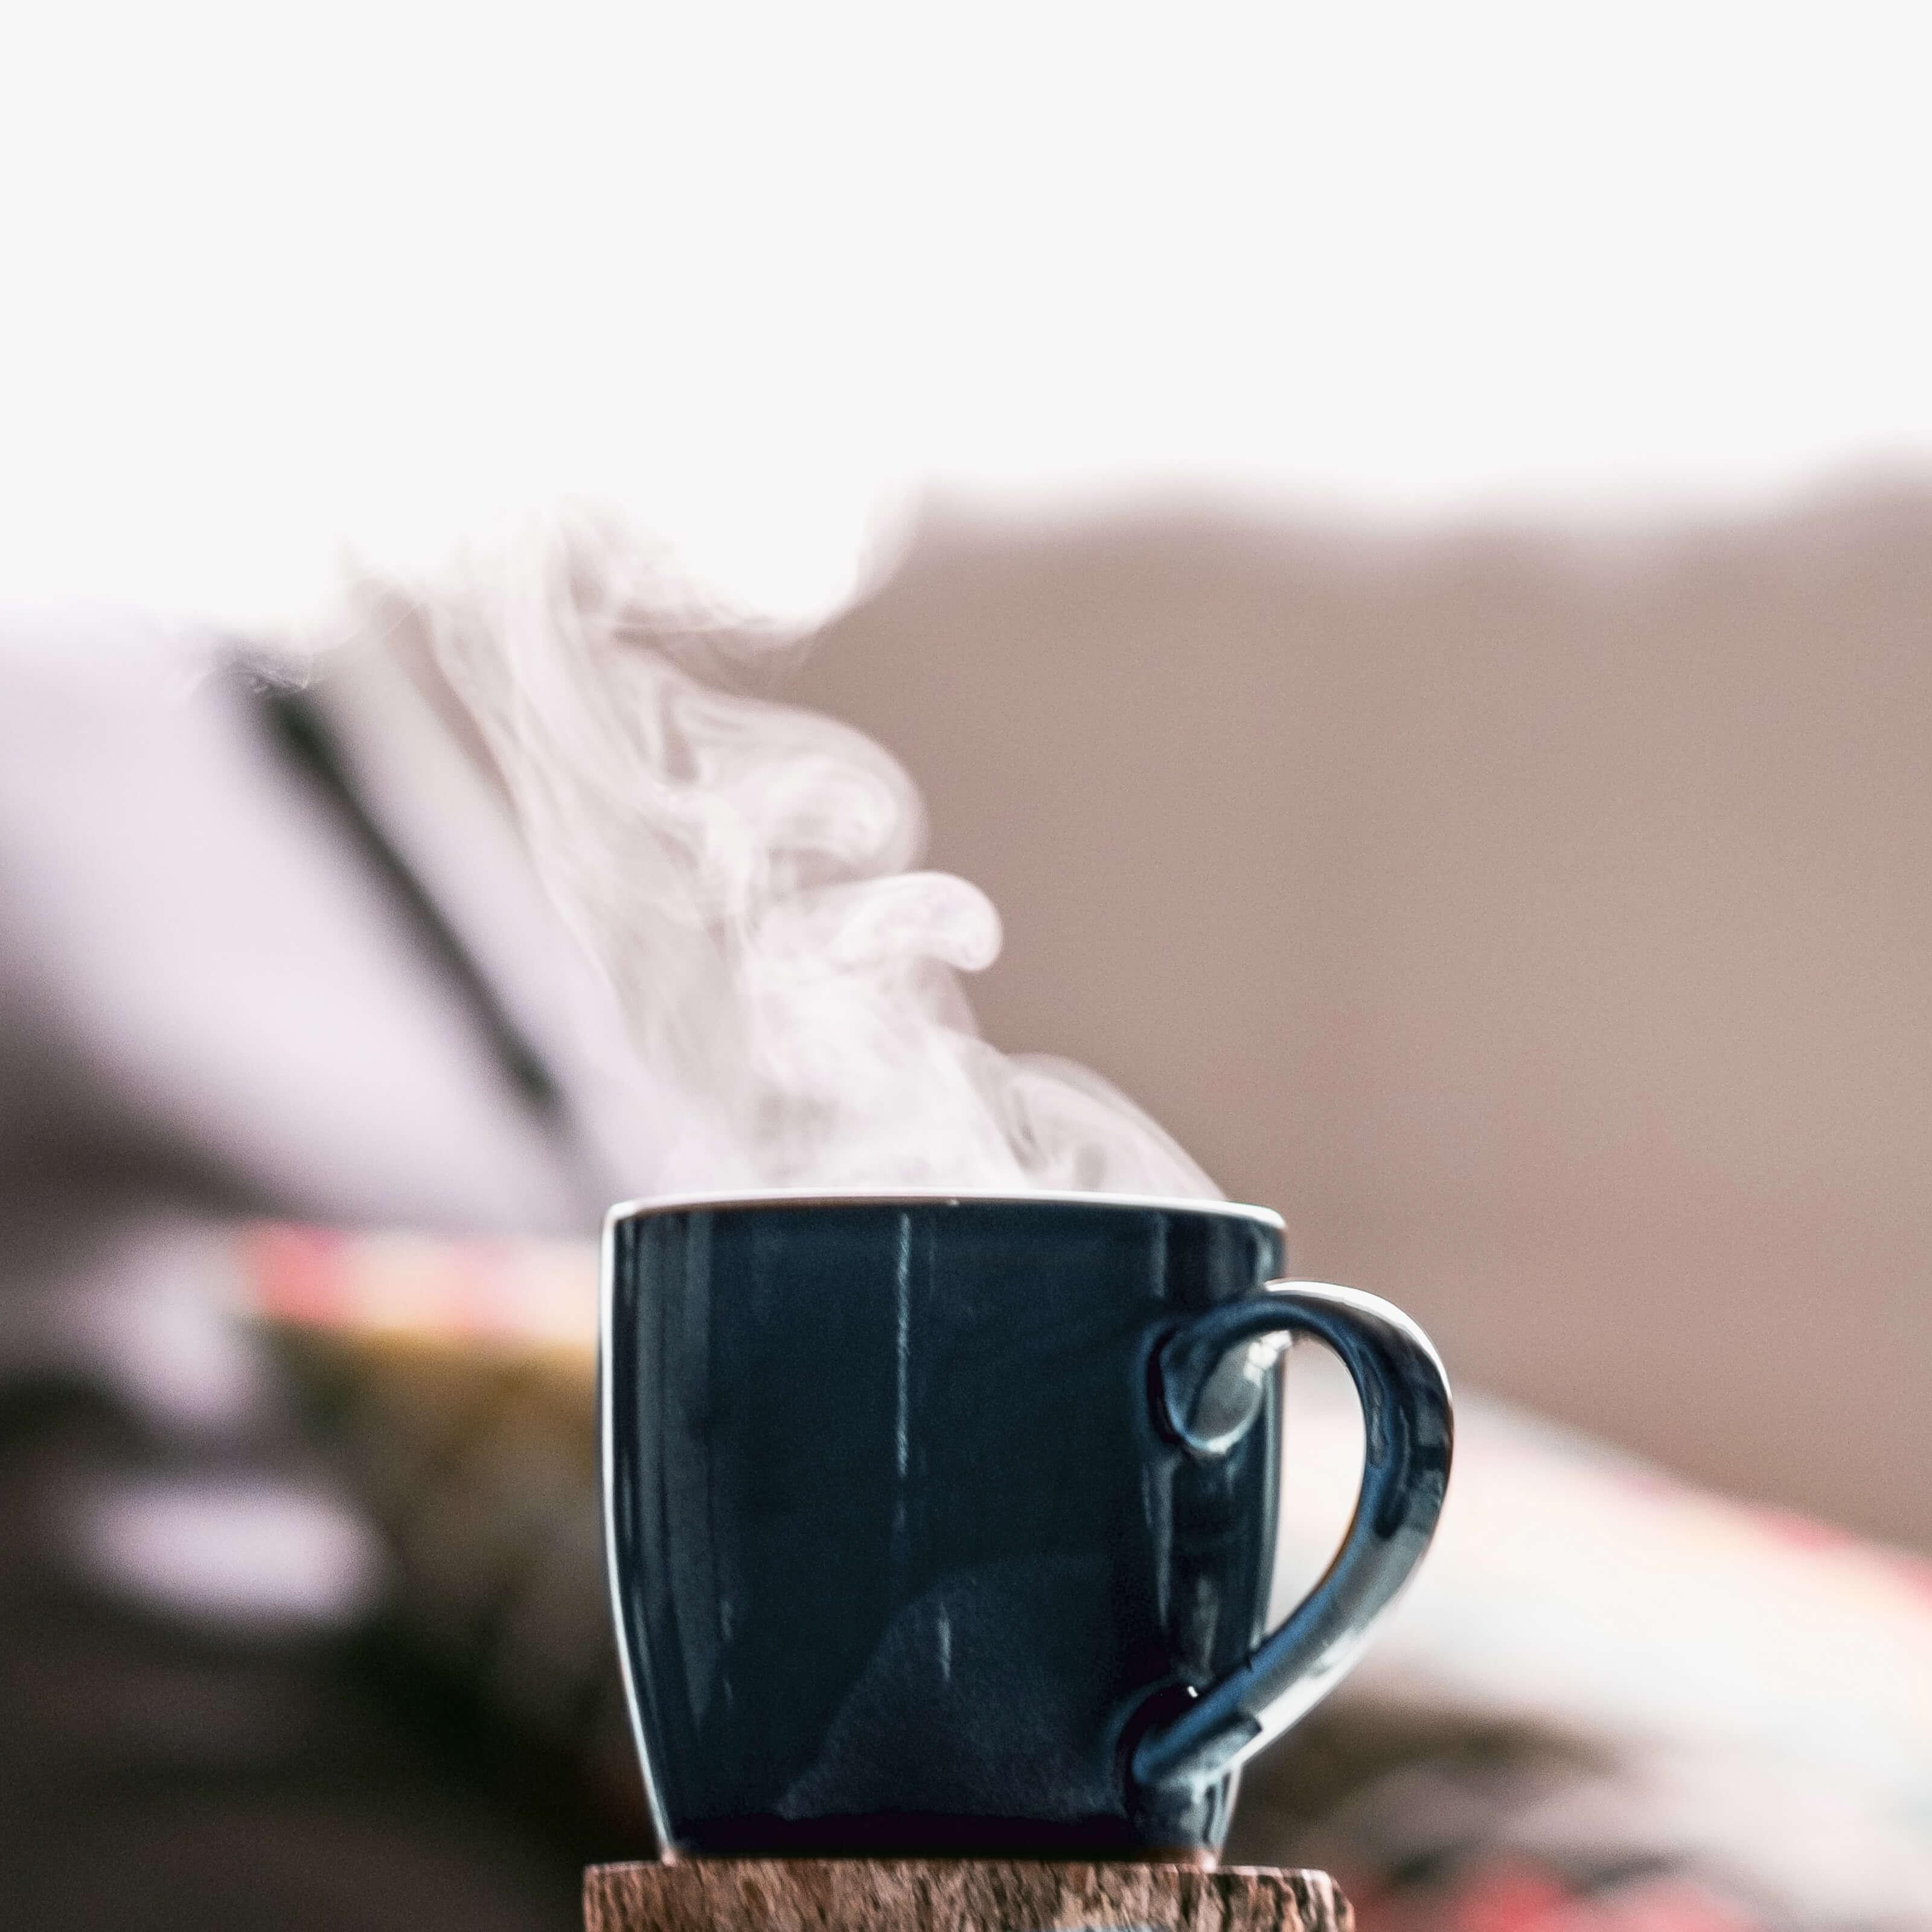 blue mug on wooden coaster, steam rising